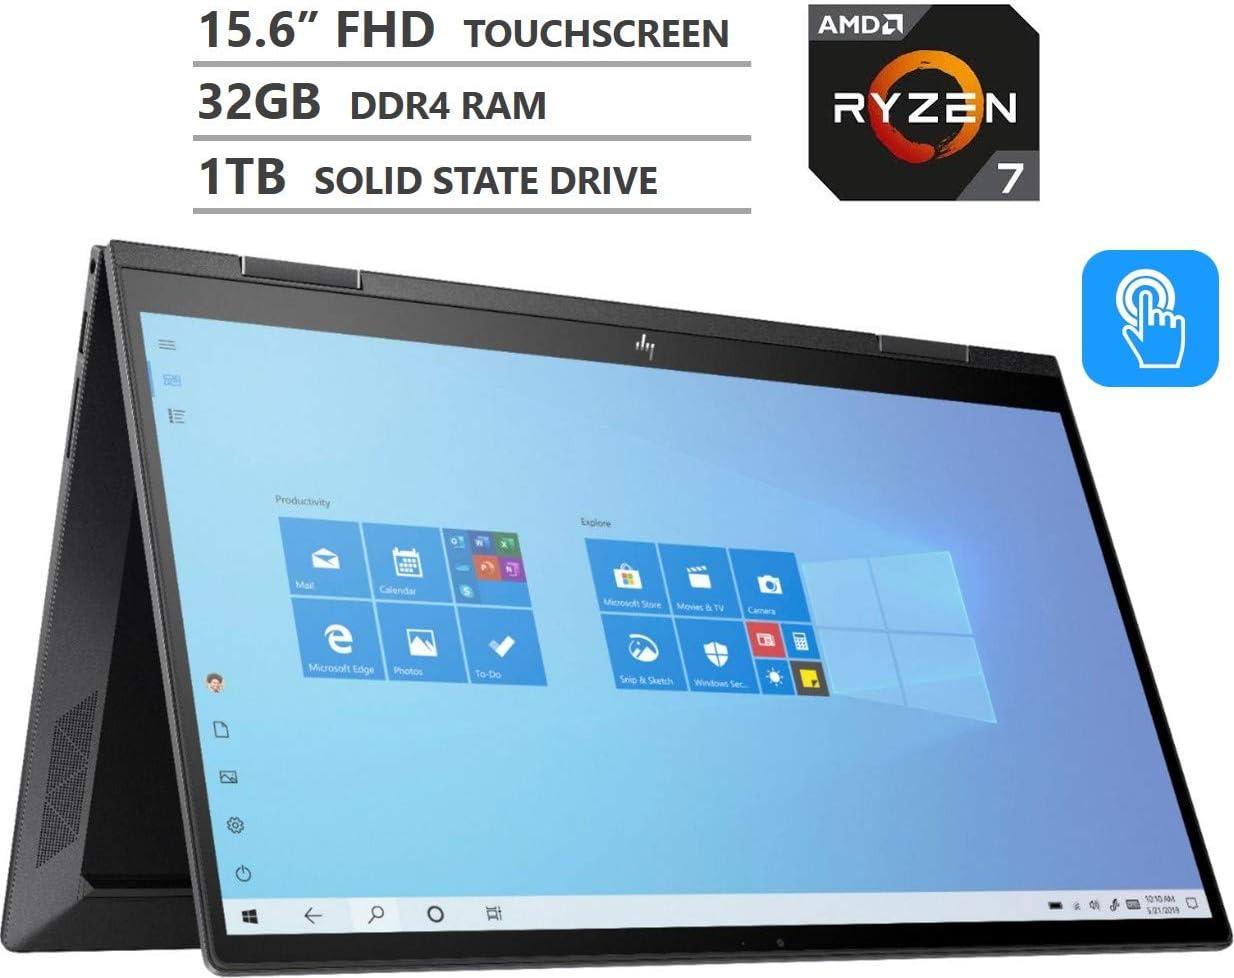 2020 HP Envy X360 2-in-1 15.6 Inch Touchscreen Laptop (AMD Quad-Core Ryzen 7, AMD Radeon RX Vega 10, 32GB RAM, 1TB SSD, Backlit Keyboard, WiFi, Bluetooth, HDMI, Windows 10 Home) (Black)